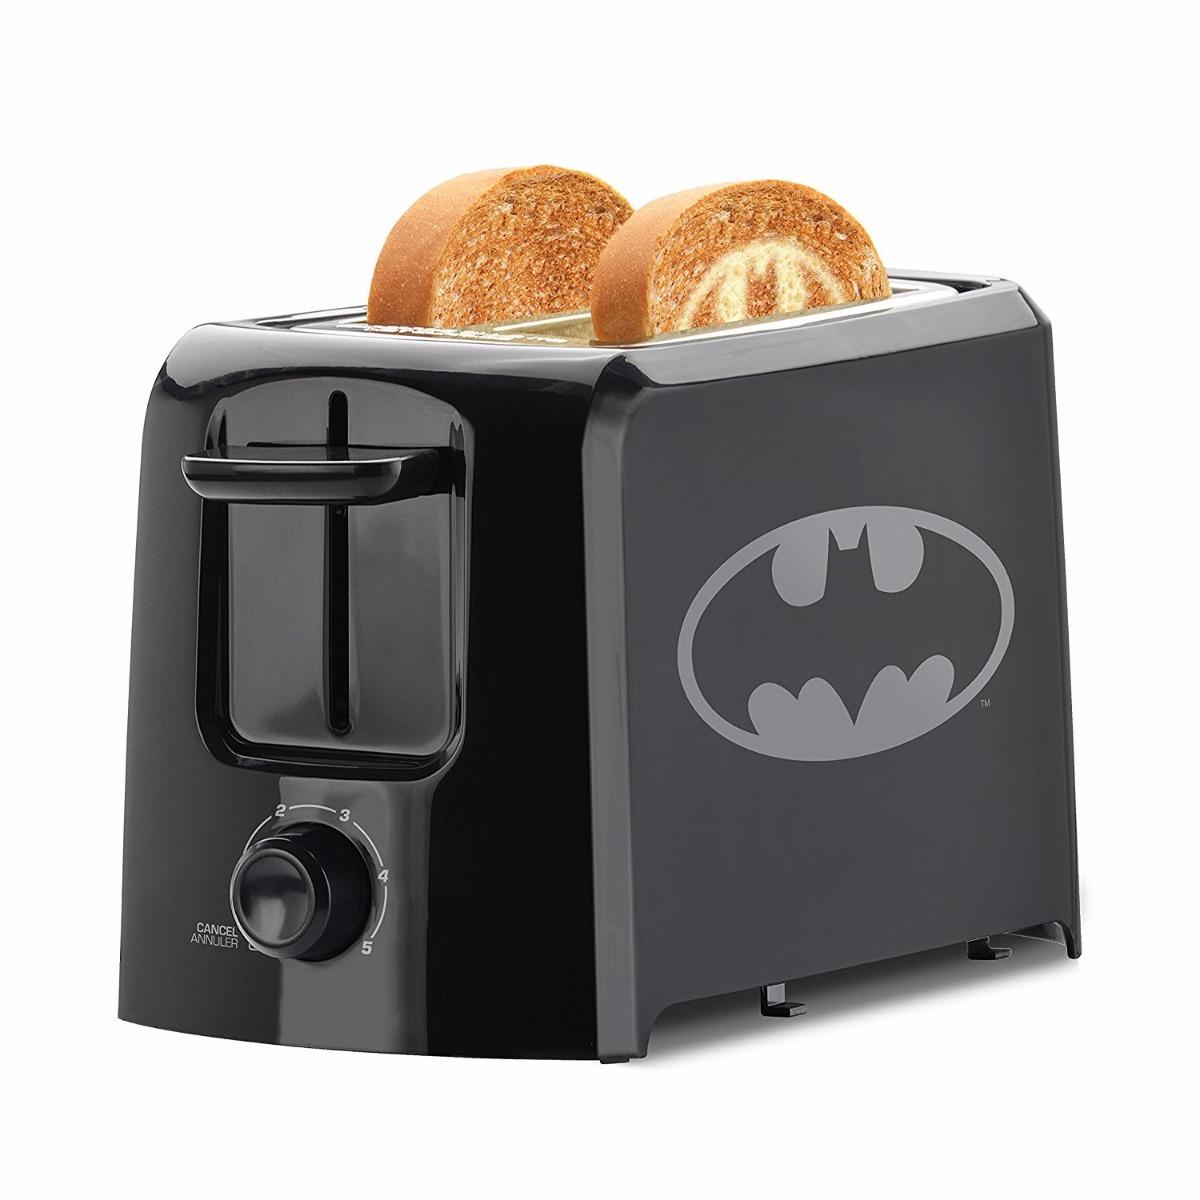 <span>SilverCrest Toaster STS 850 D1 Unboxing (Lidl 850 W B <b class=sec>2</b>…</span>